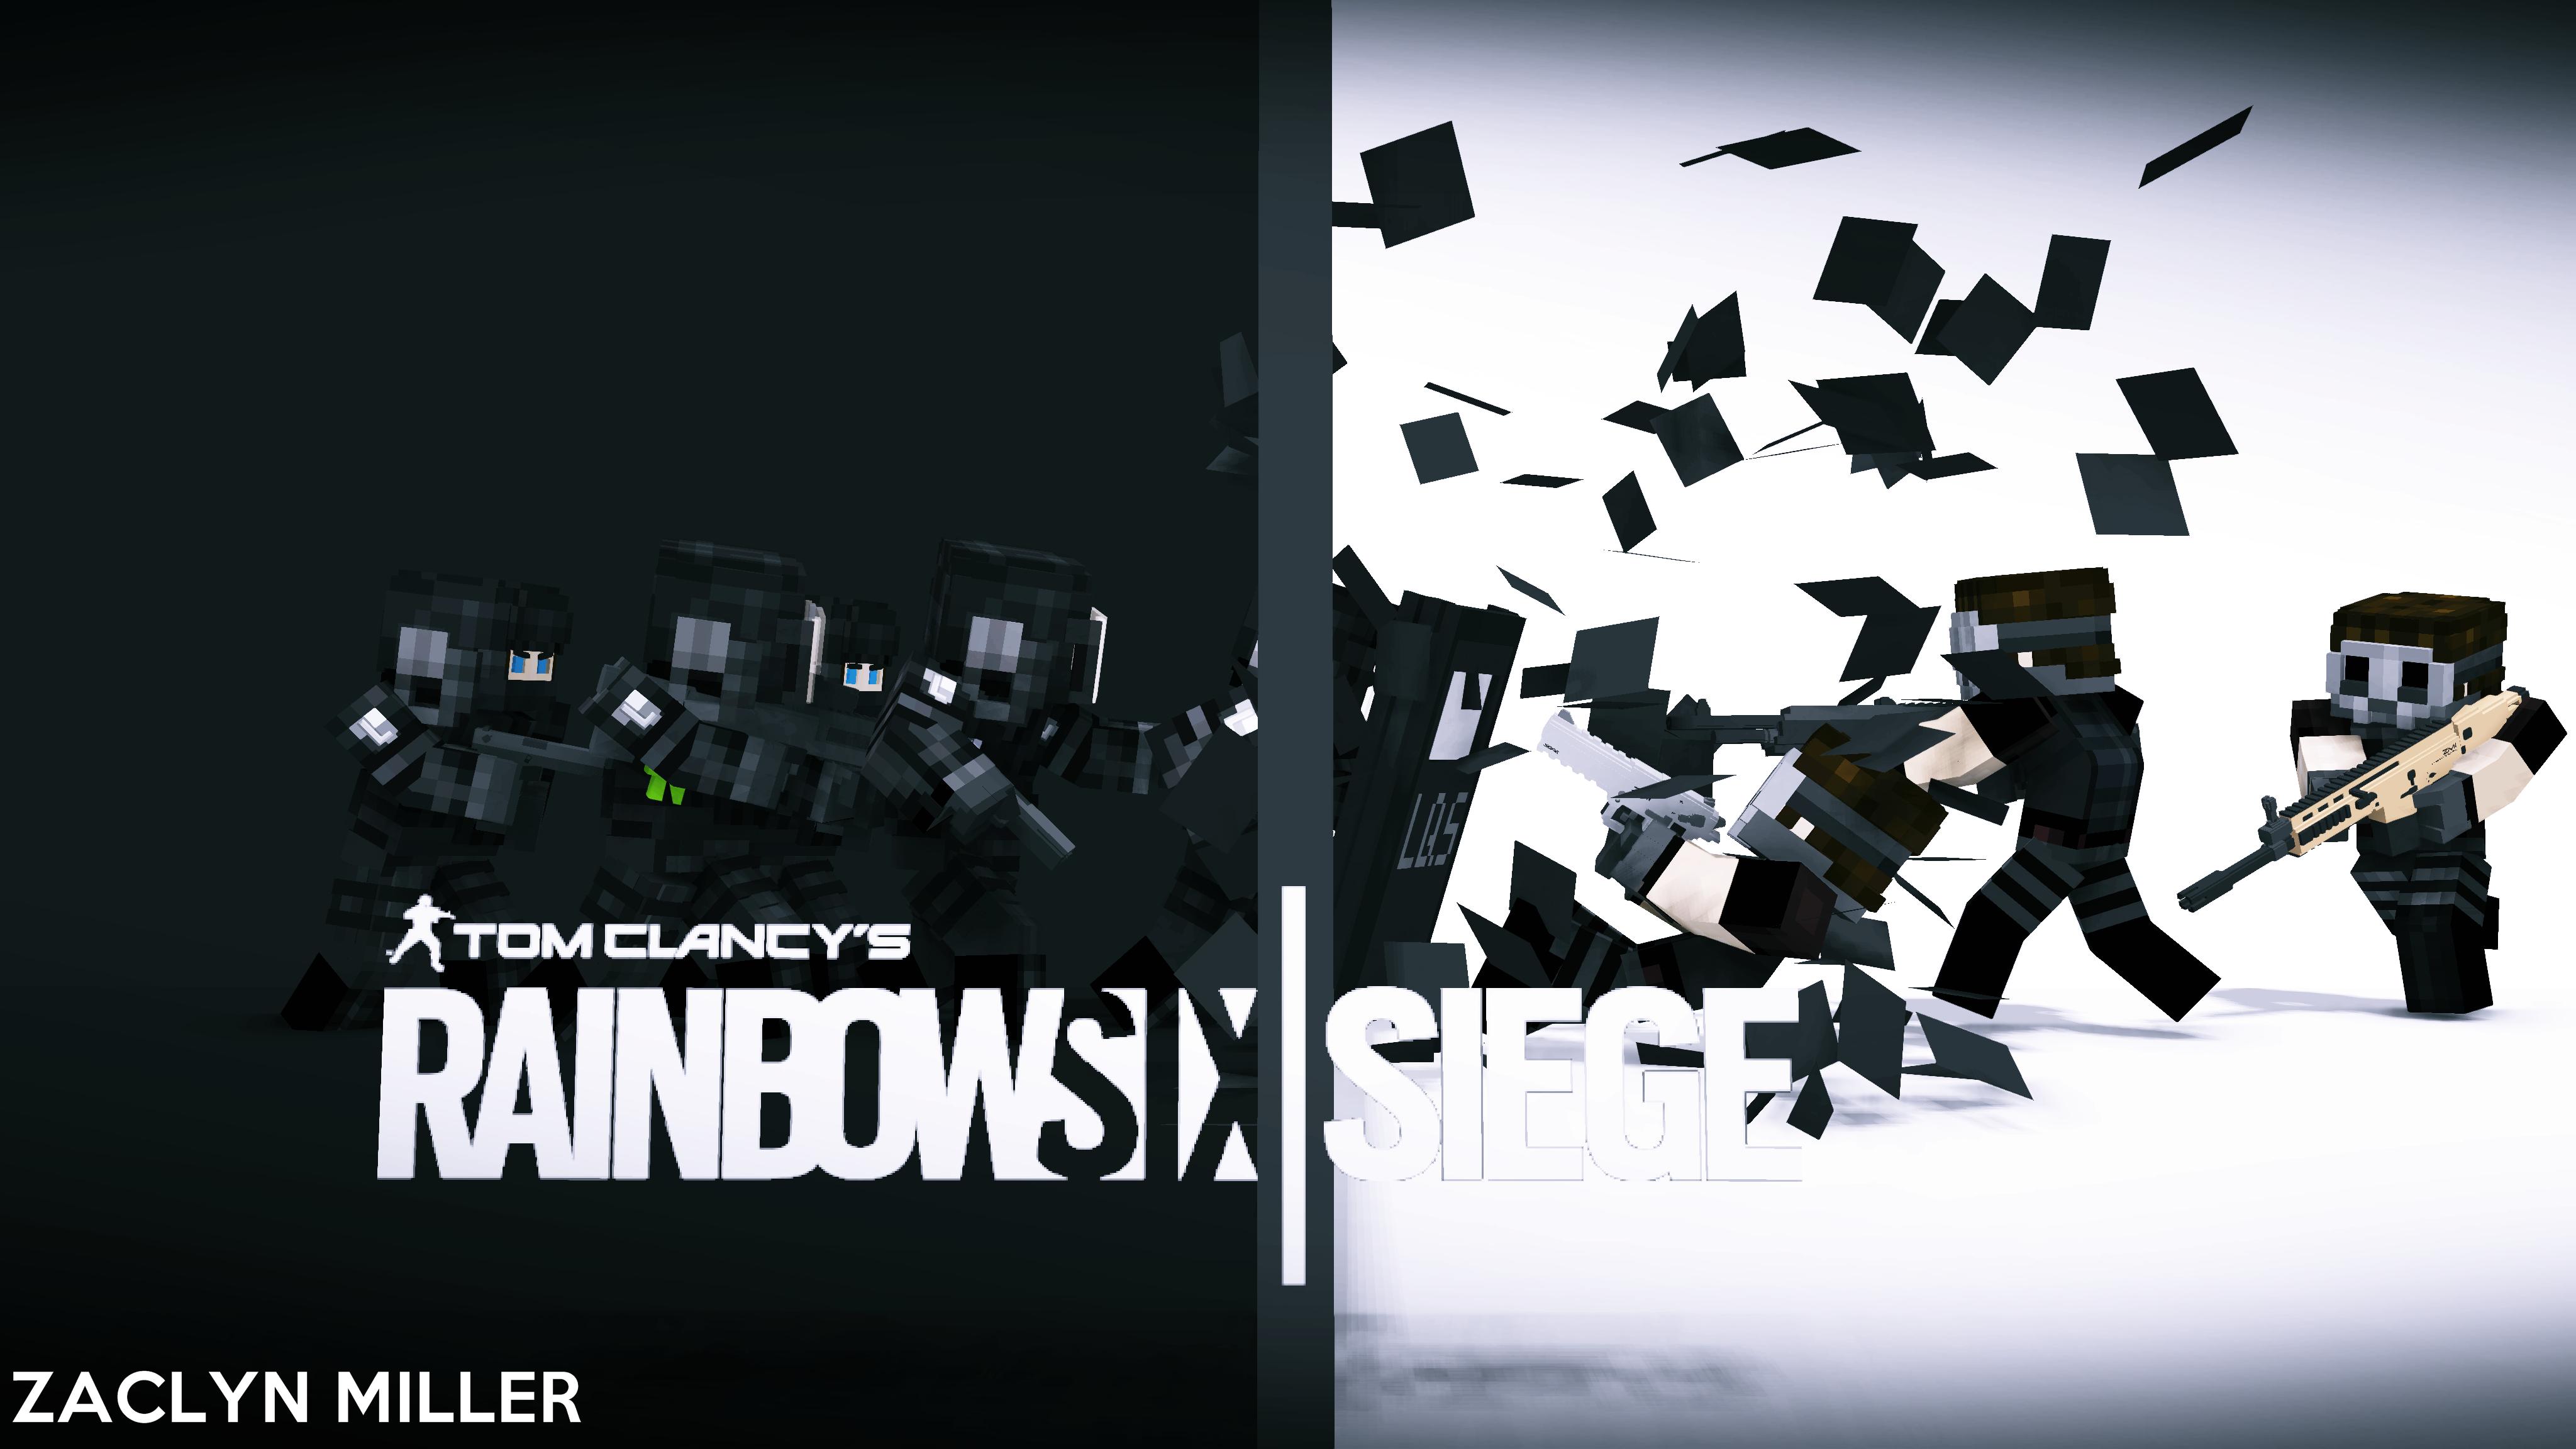 2016 Rainbow Six Siege Wallpaper - Six HD PNG